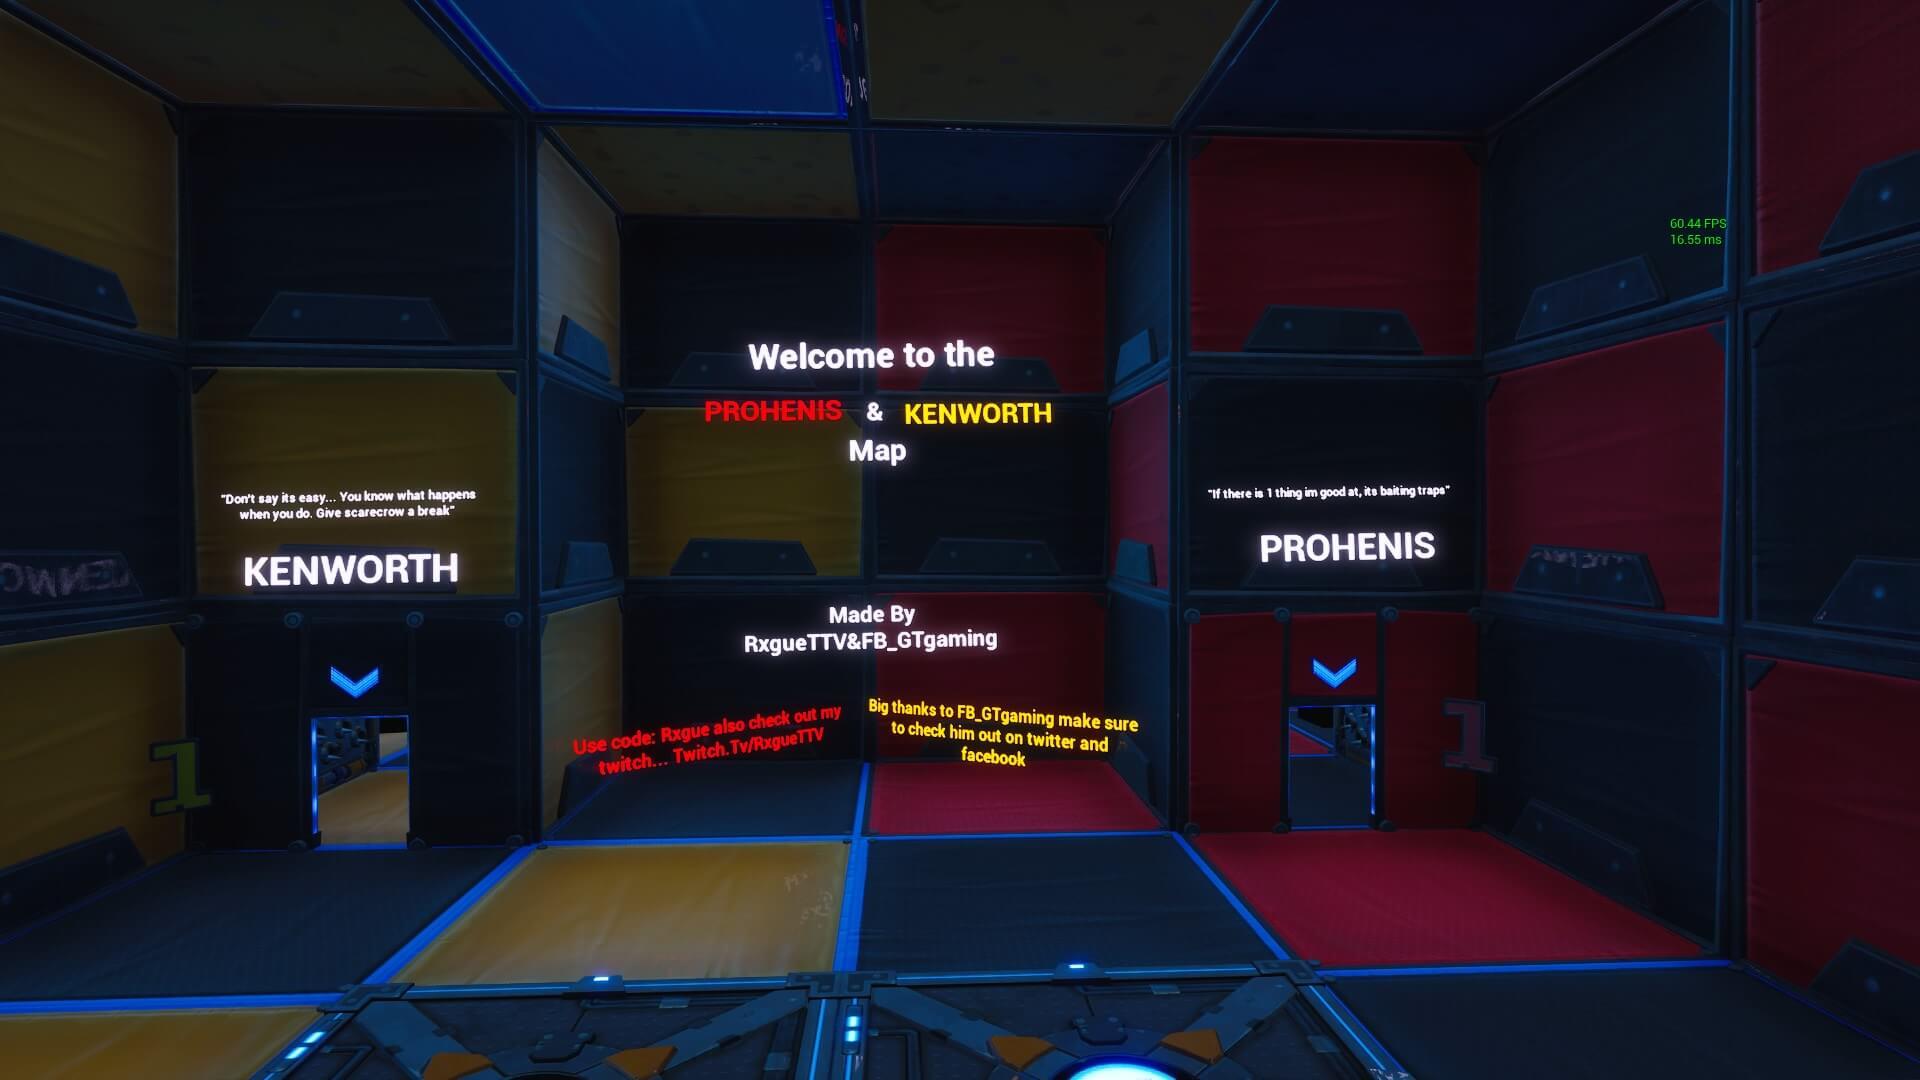 Fortnite Mini Game Map Codes - Fortnite Creative Codes - Dropnite com